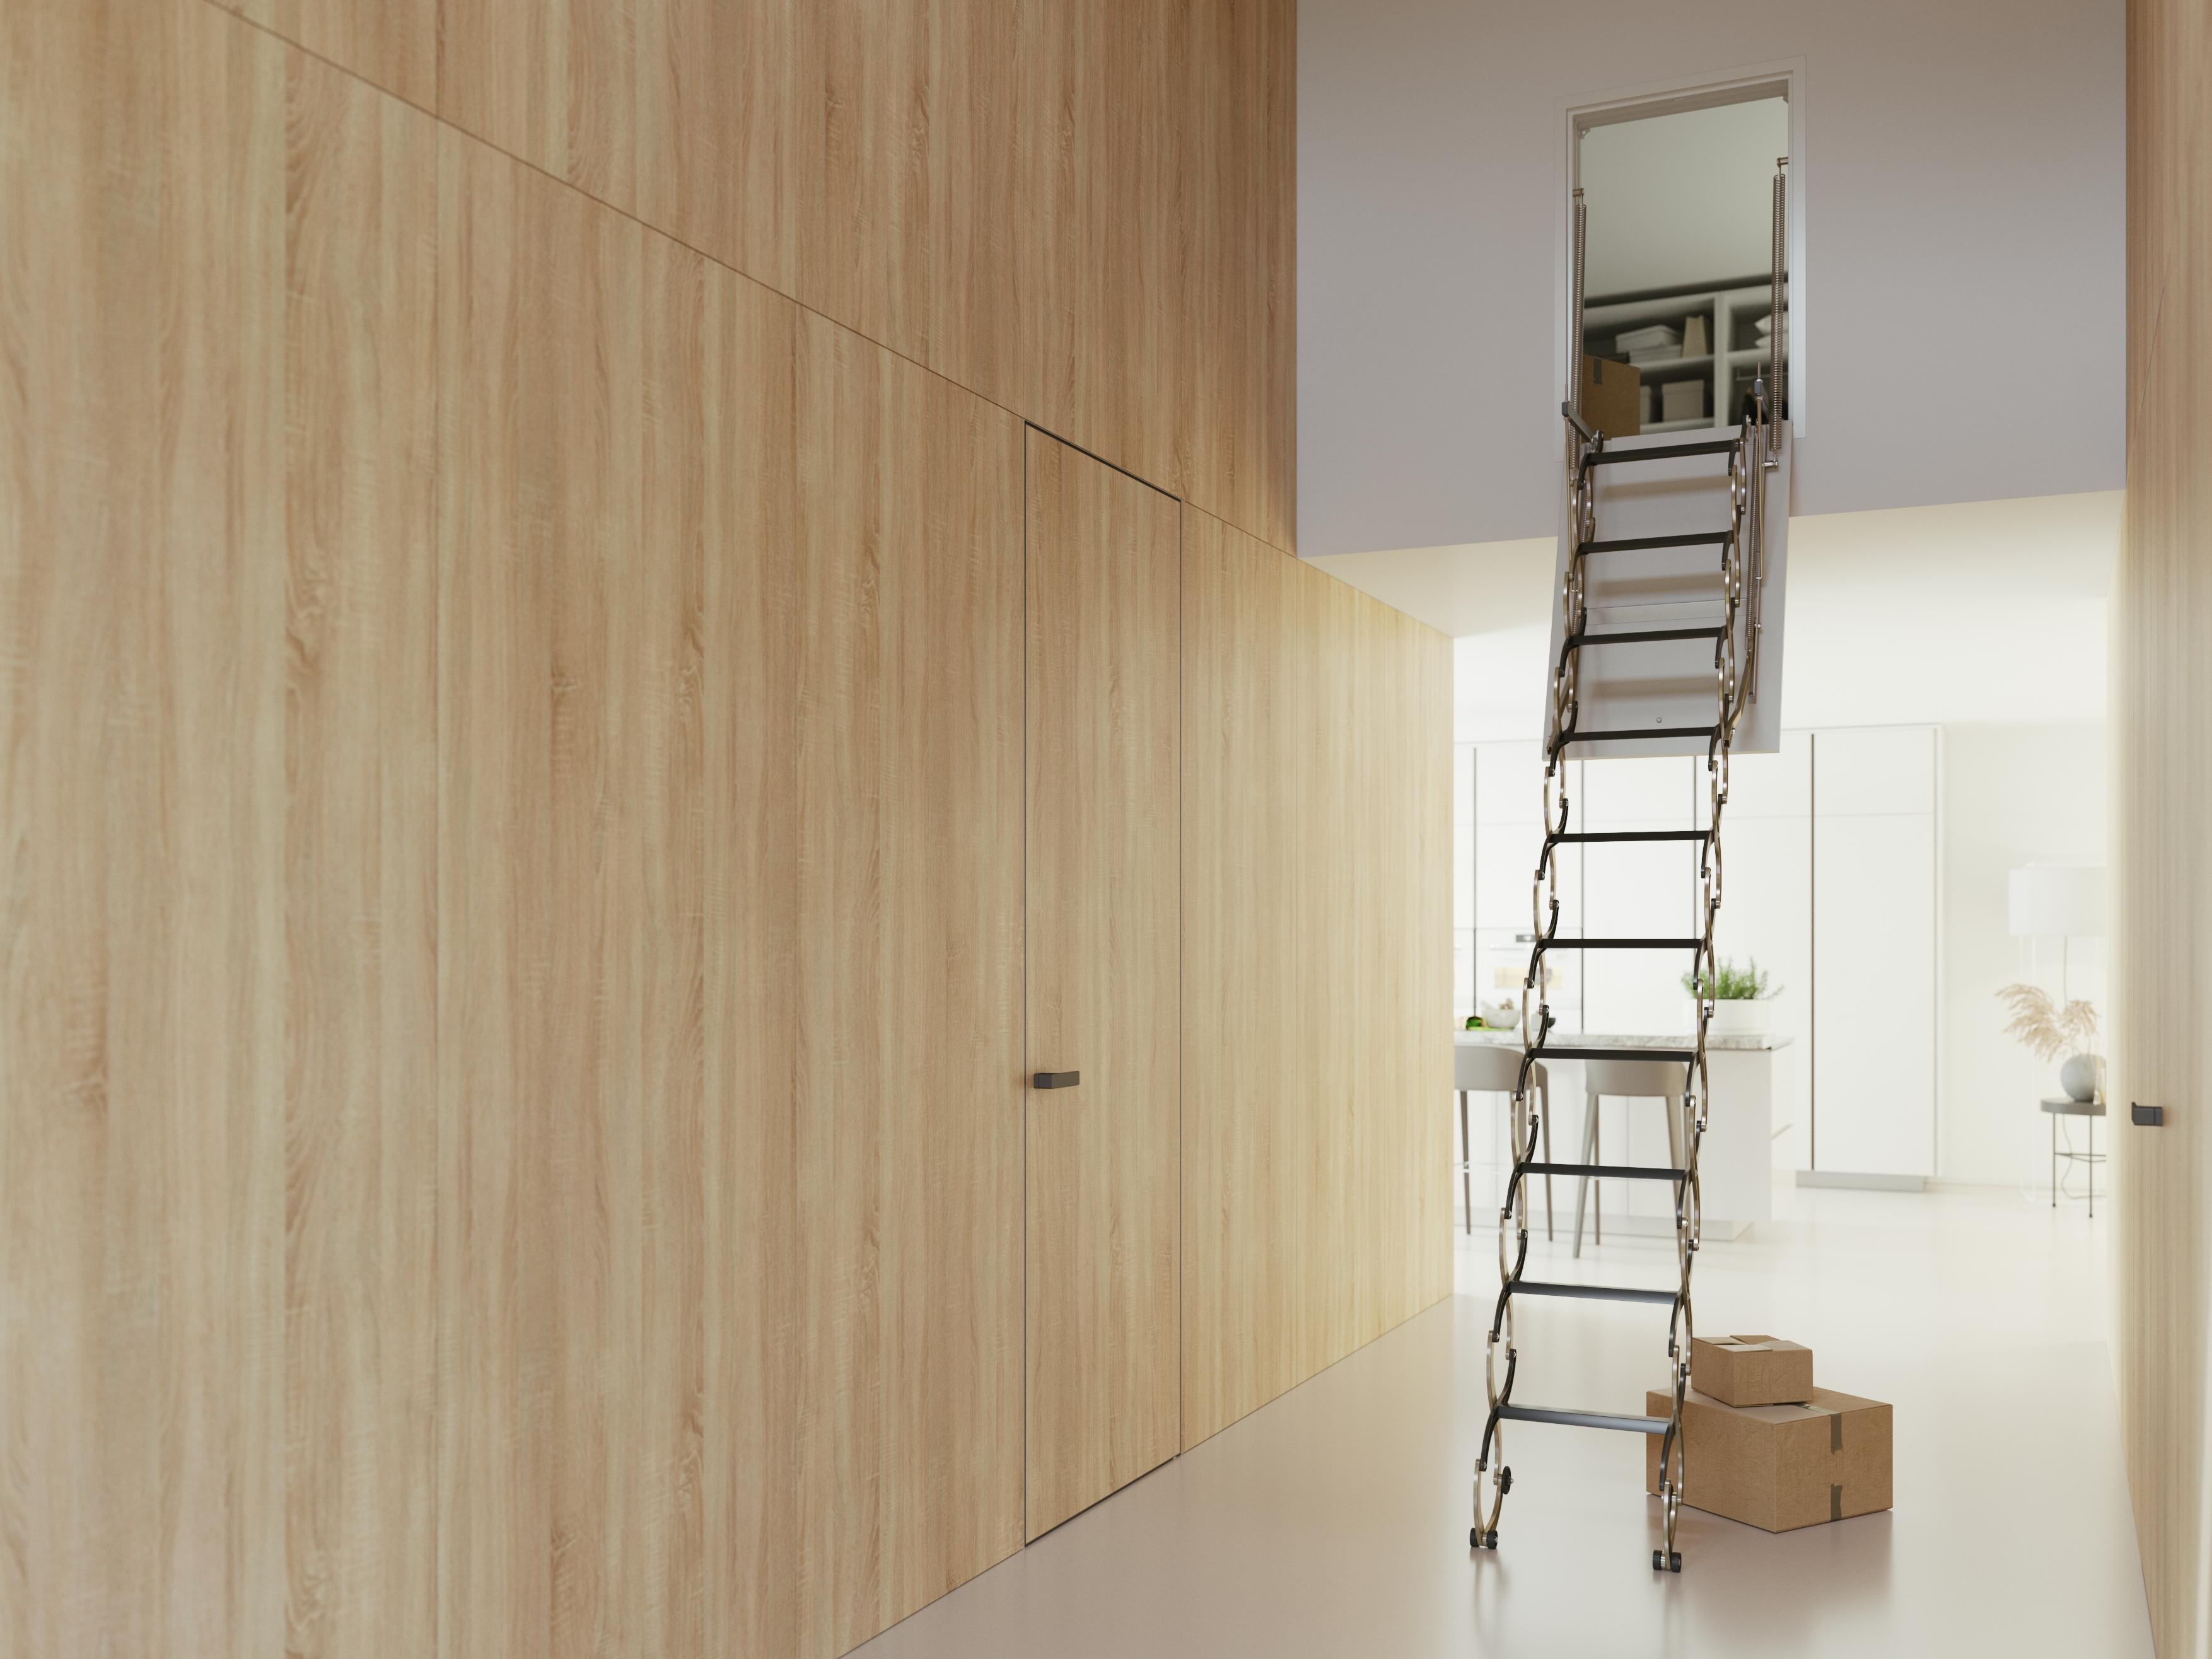 stahovaci schody VERTICALE drevotriskove viko foto zdroj JAP FUTURE 1